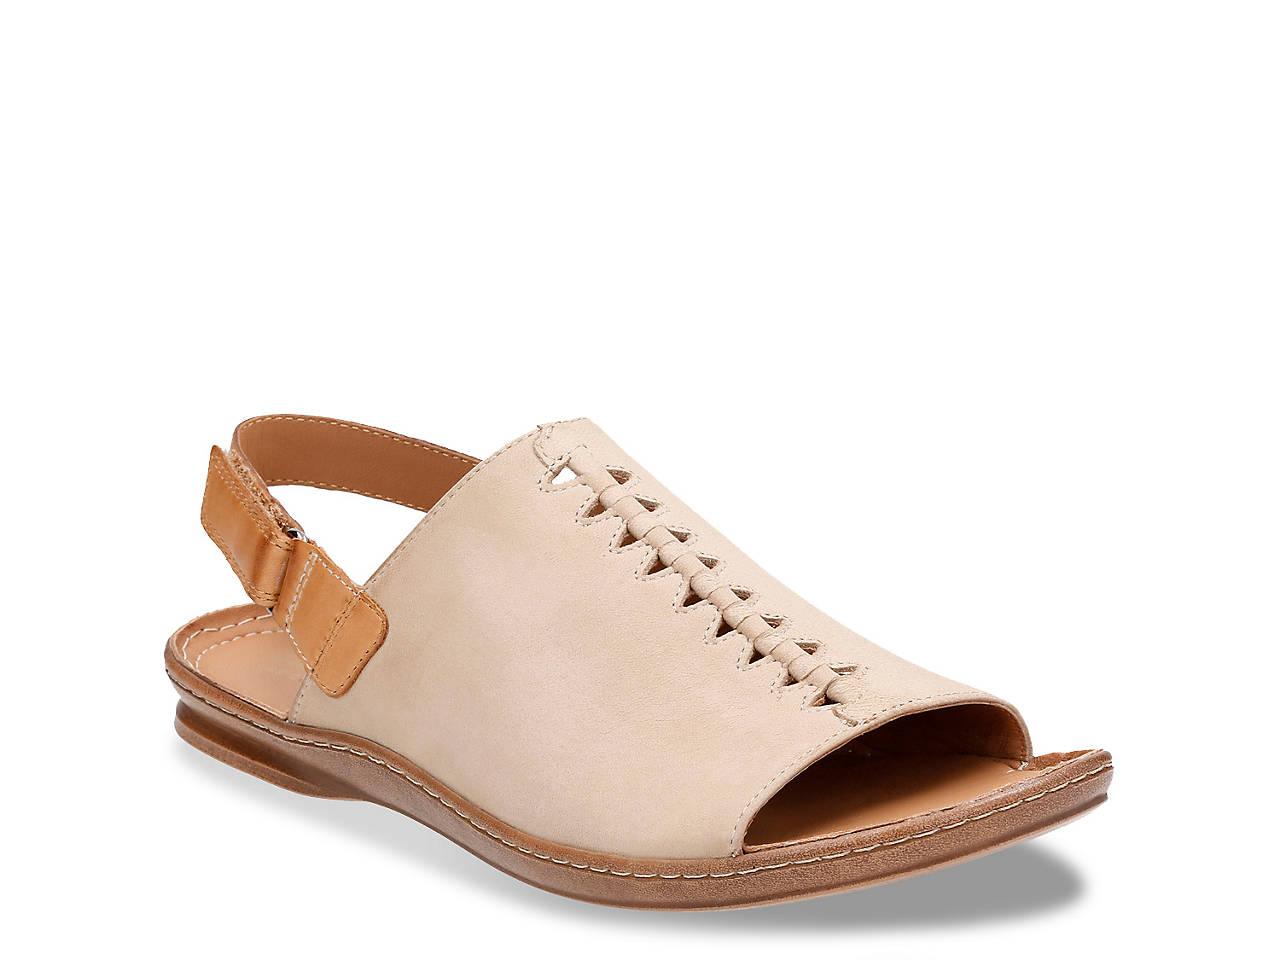 Clarks Sarla Forte Flat Sandal Women s Shoes